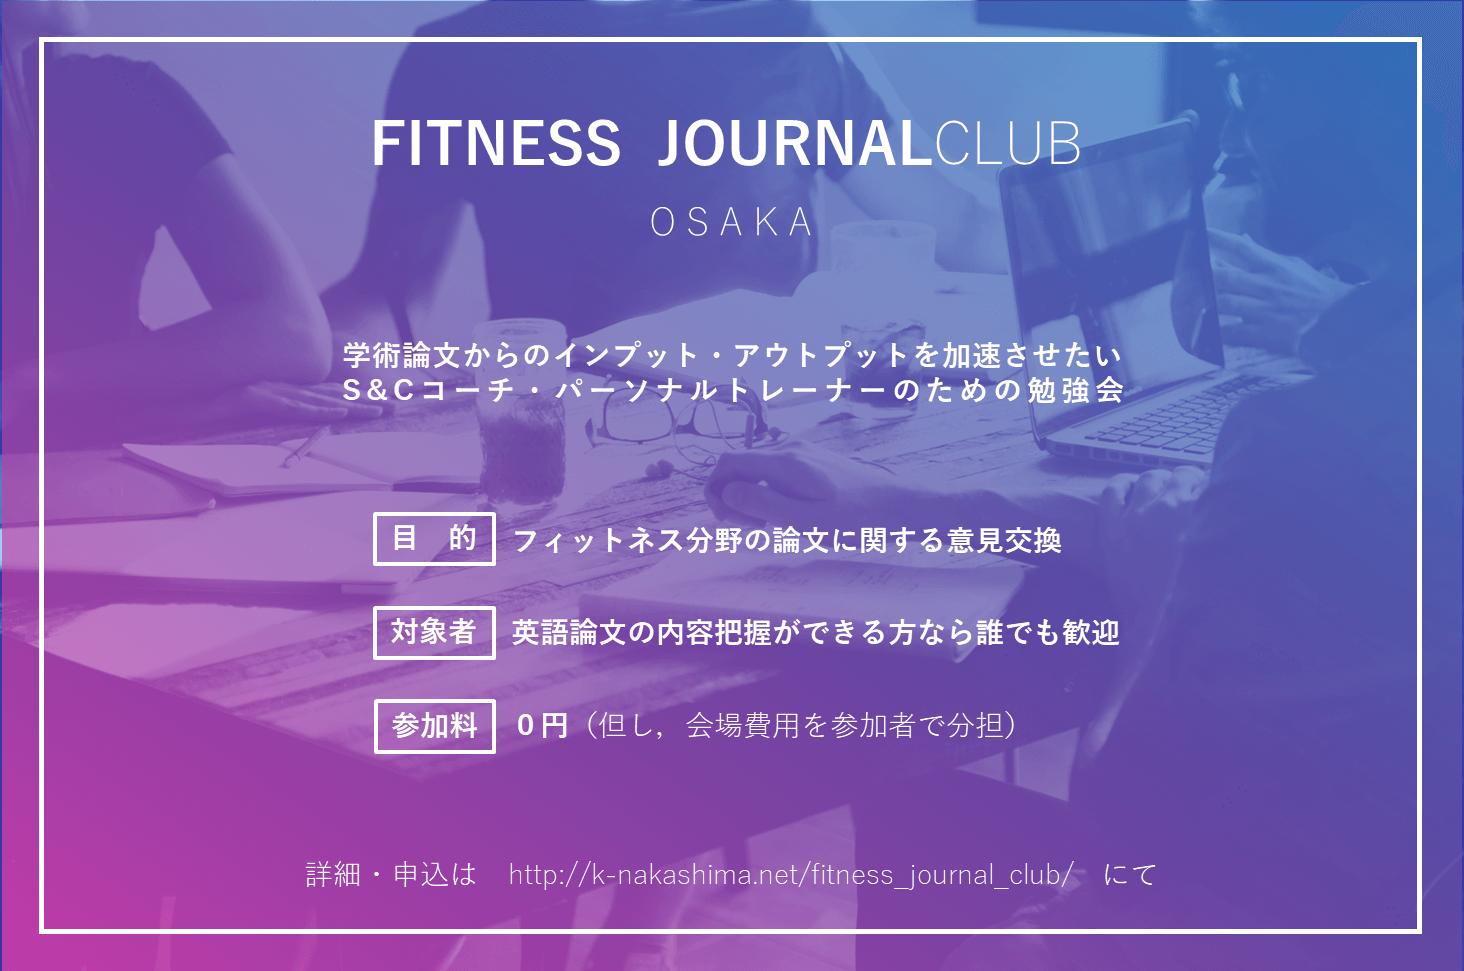 FITNESS JOURNAL CLUB開催のお知らせ